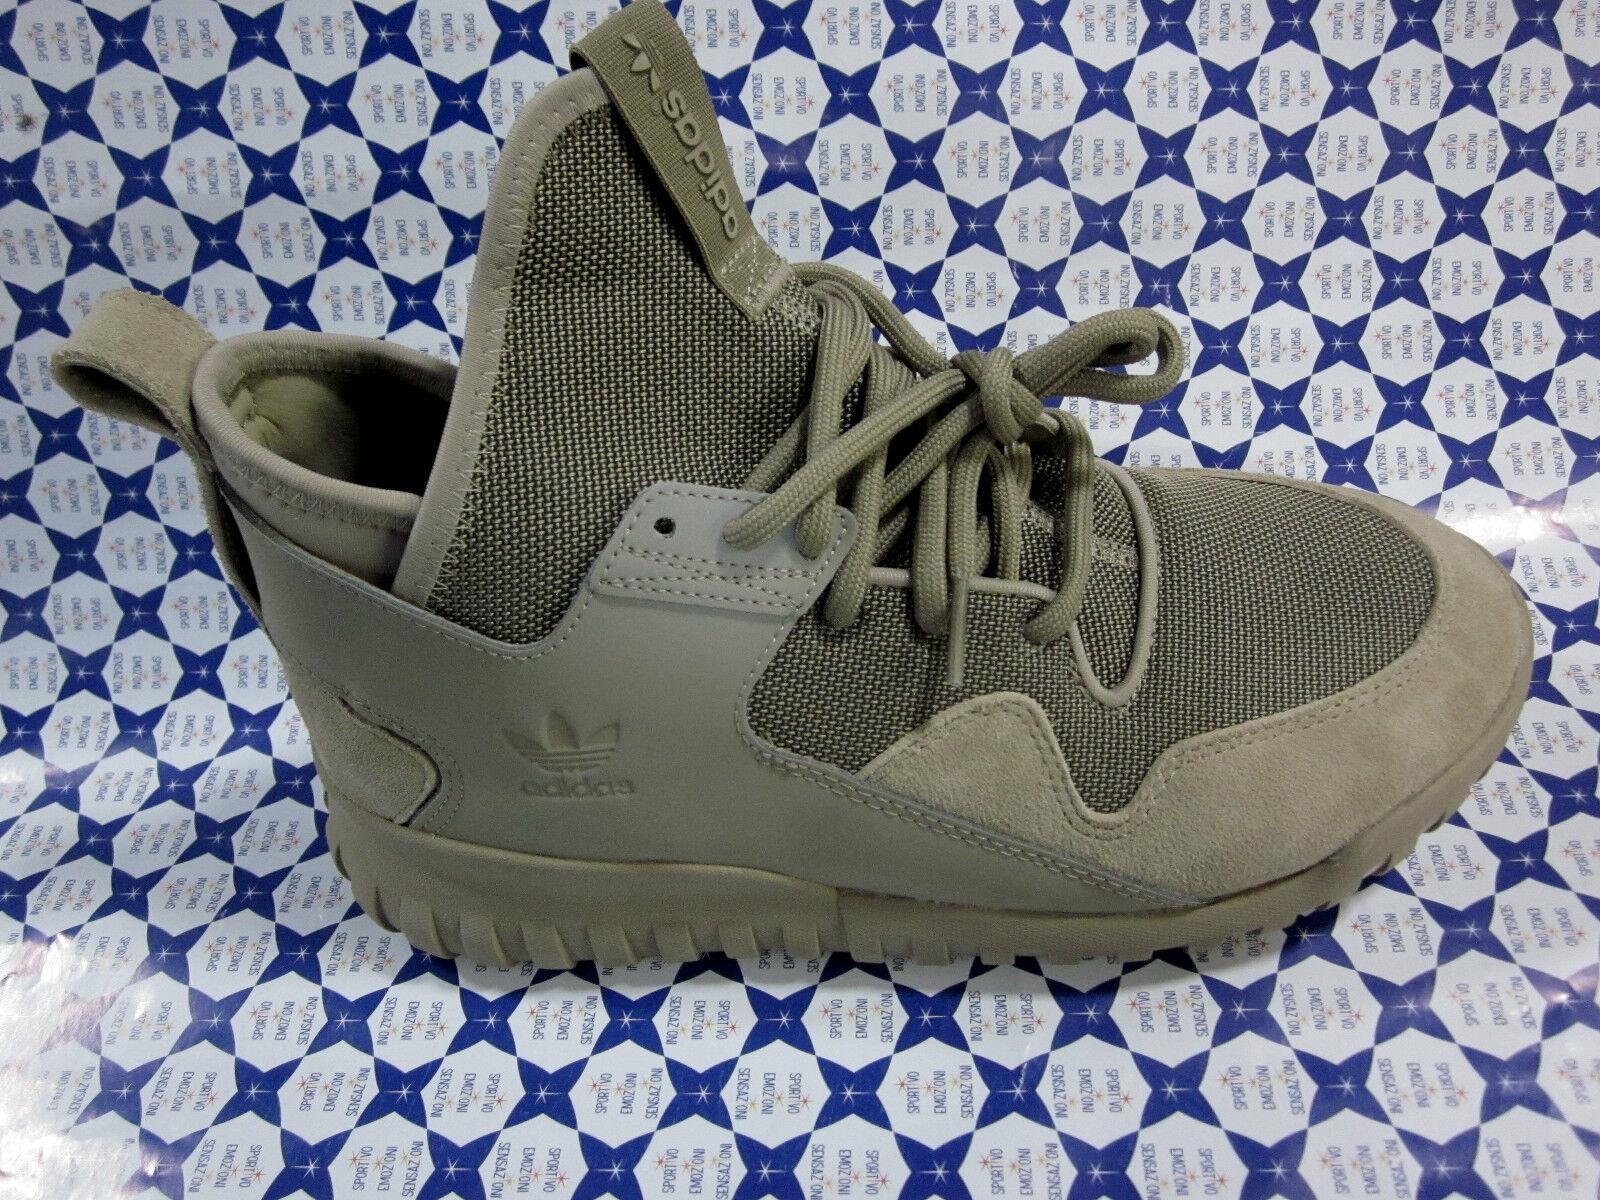 shoes Scarponcino Adidas Tubular X - Beige S74923